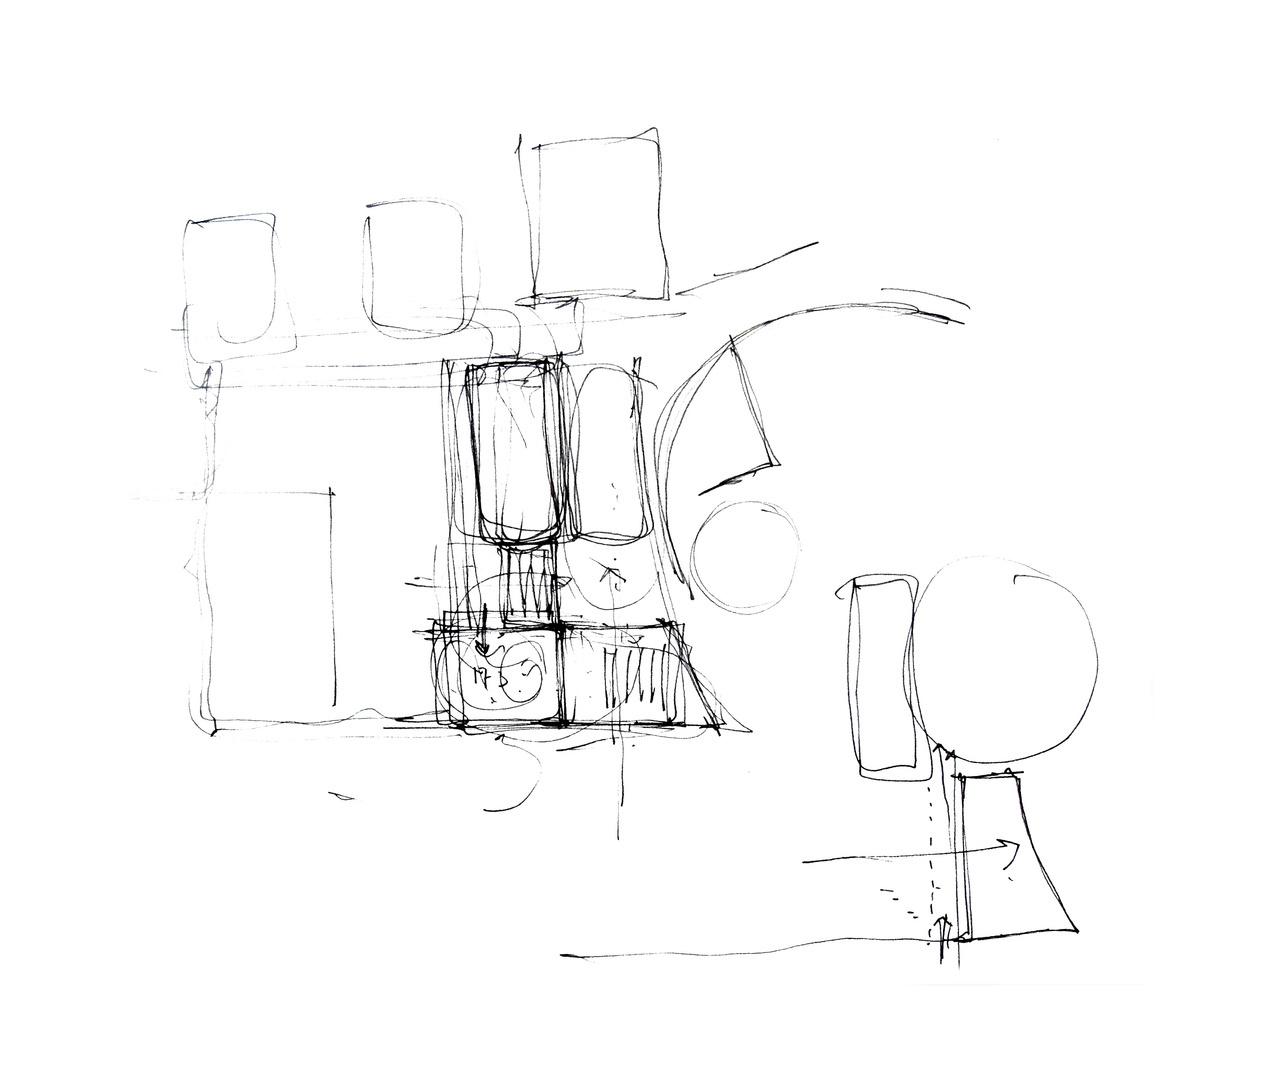 kta_web_dasoupoli_sketch2_small.jpg